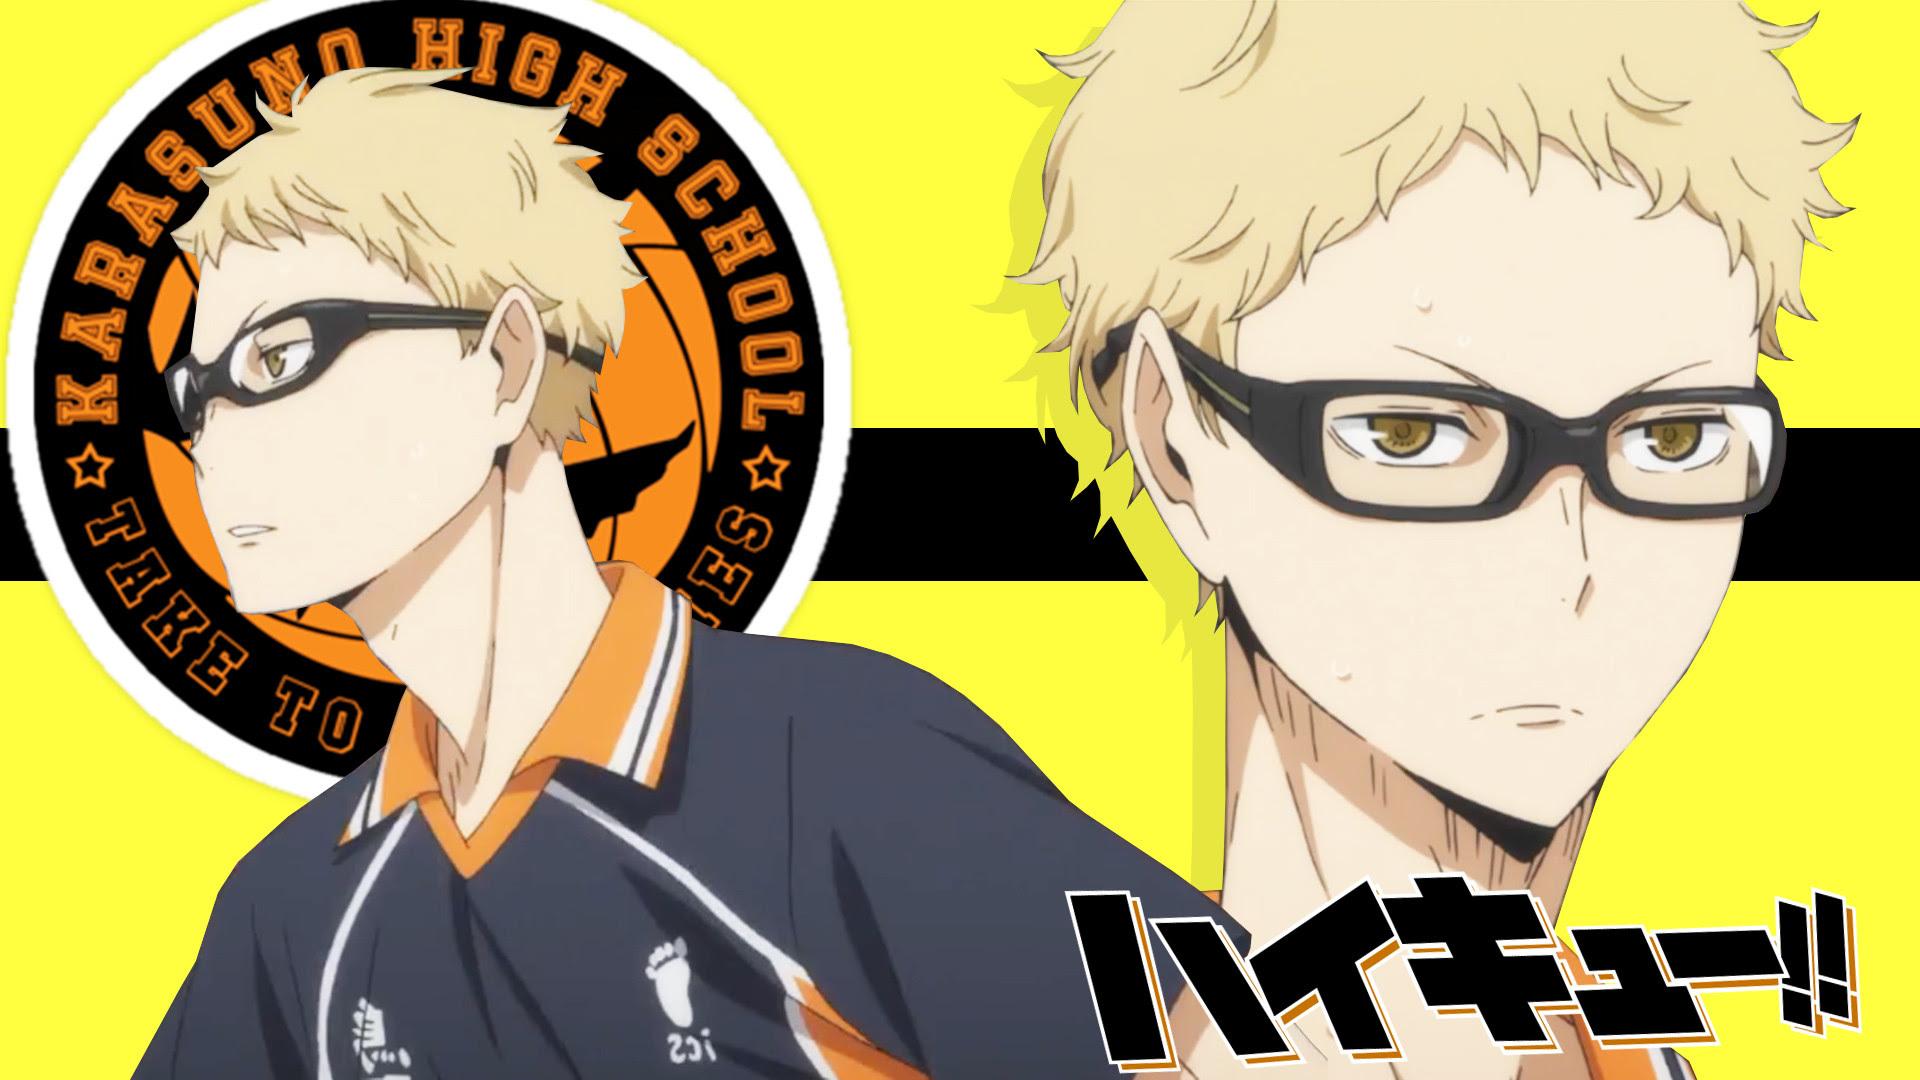 Download Anime Pc Wallpaper Haikyuu PNG